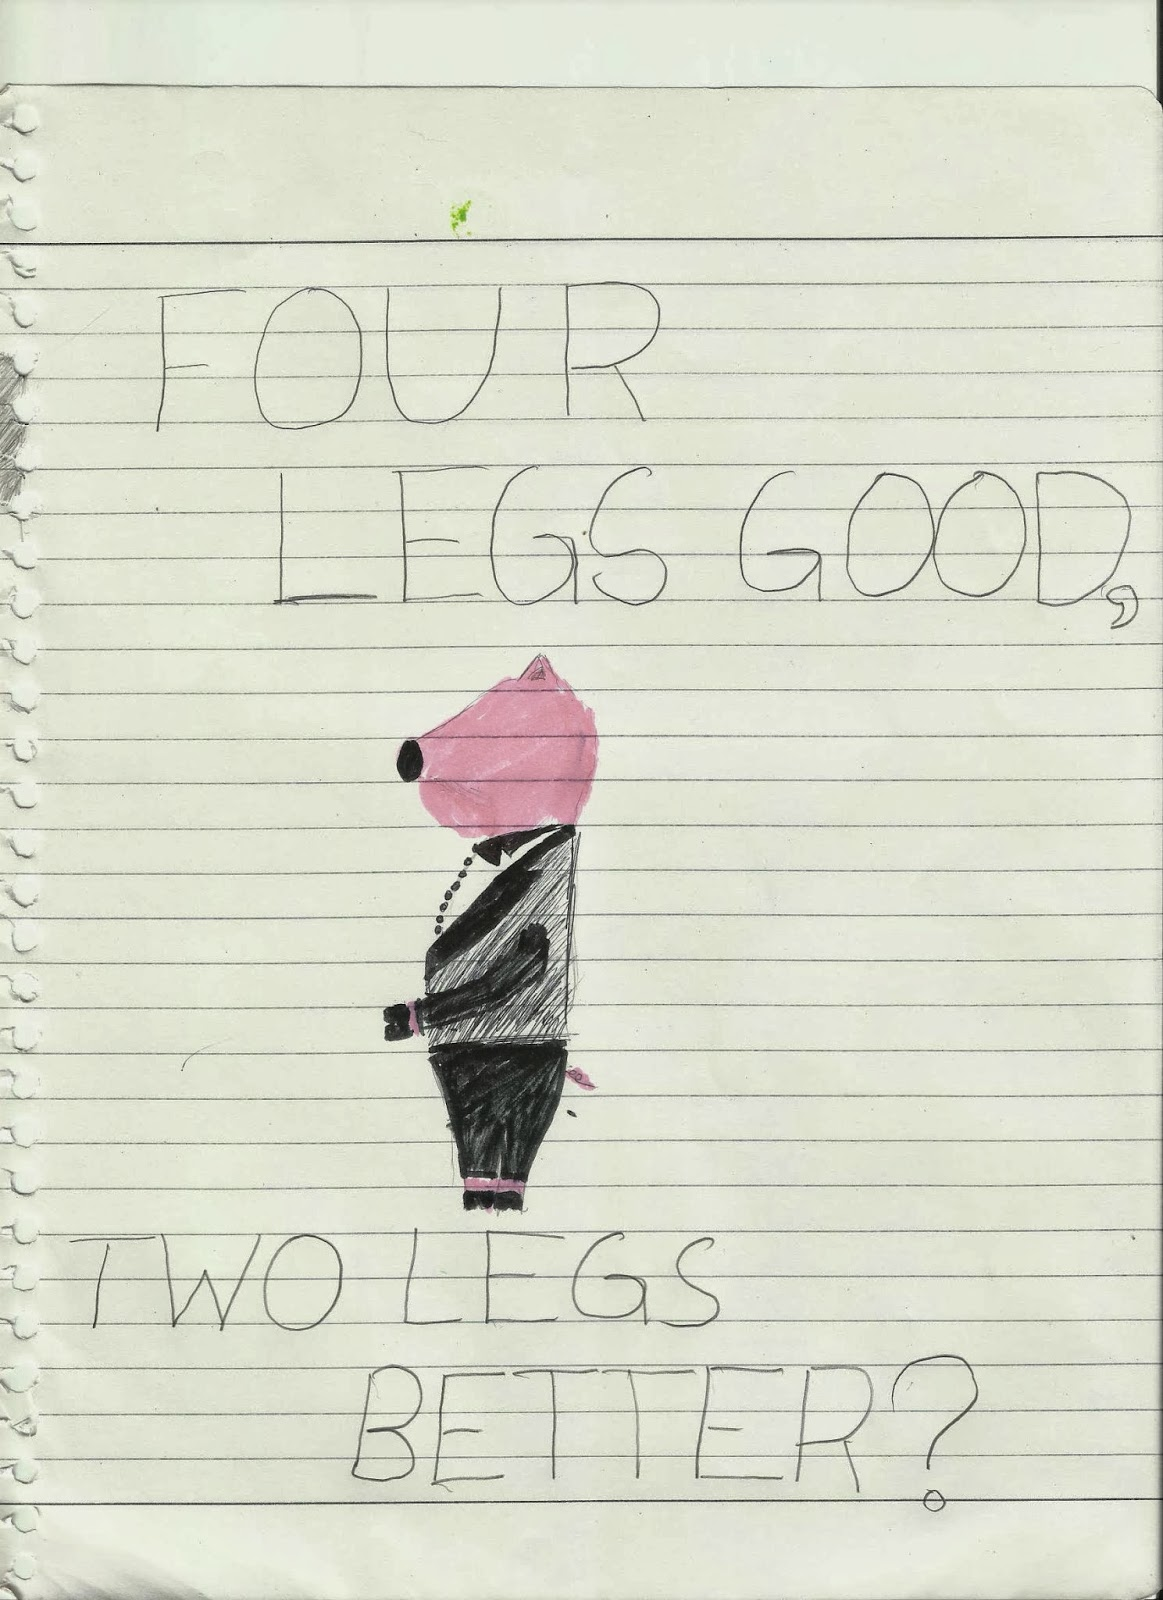 Animal Farm Chapter 10 Propaganda Poster